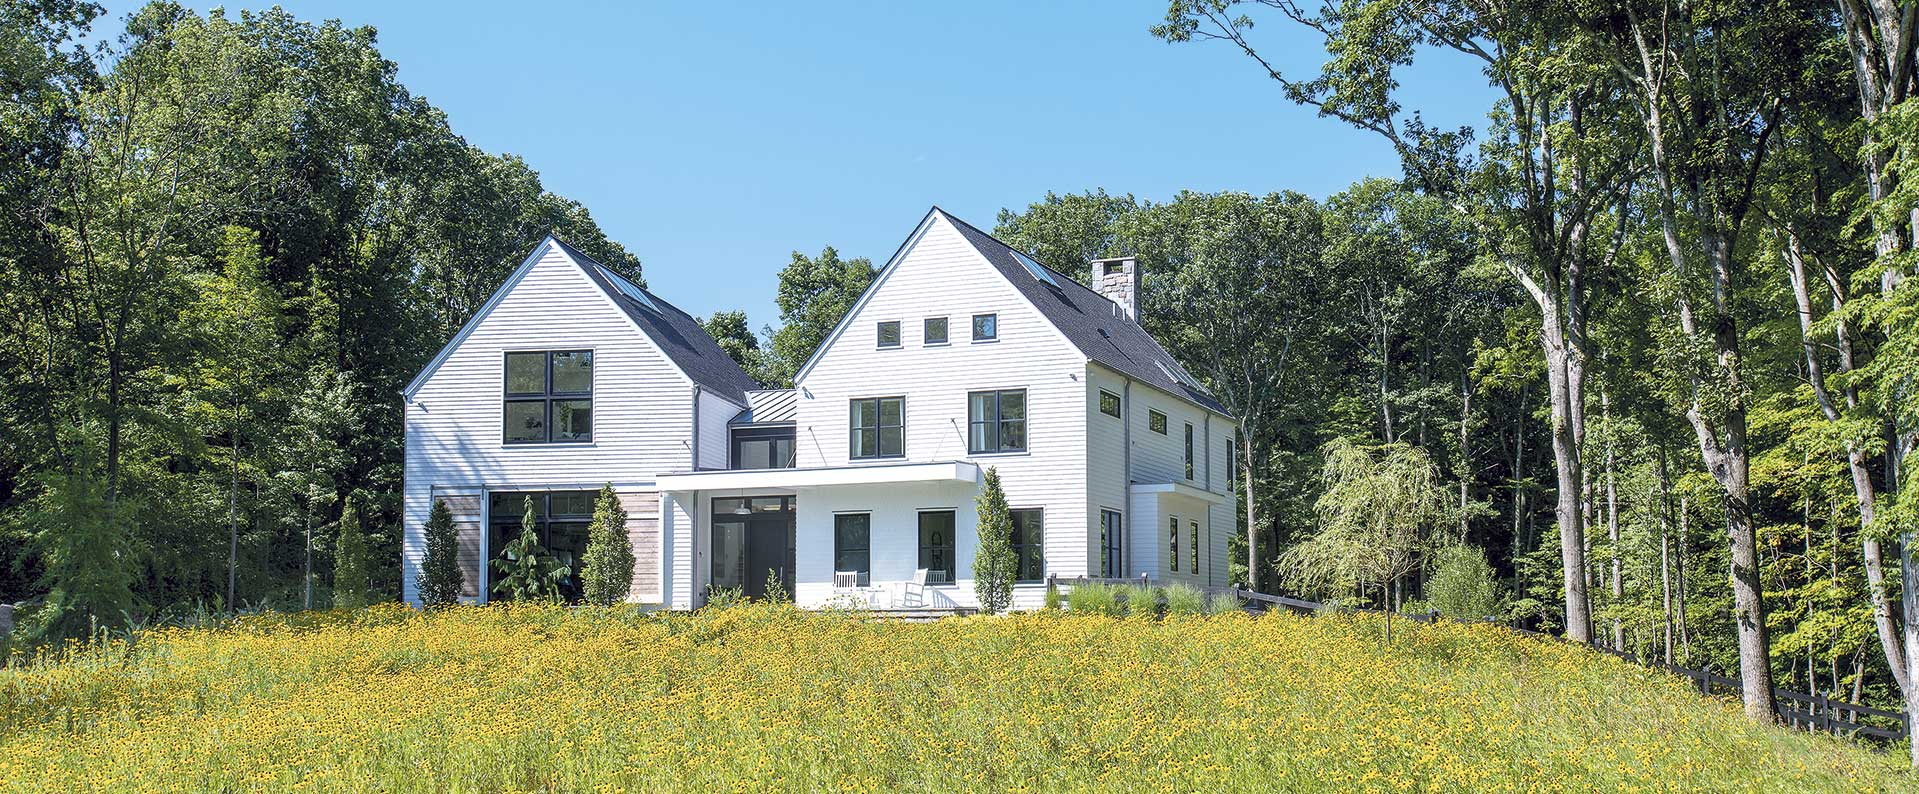 1-fletcher-vendor-house-fletcher-development